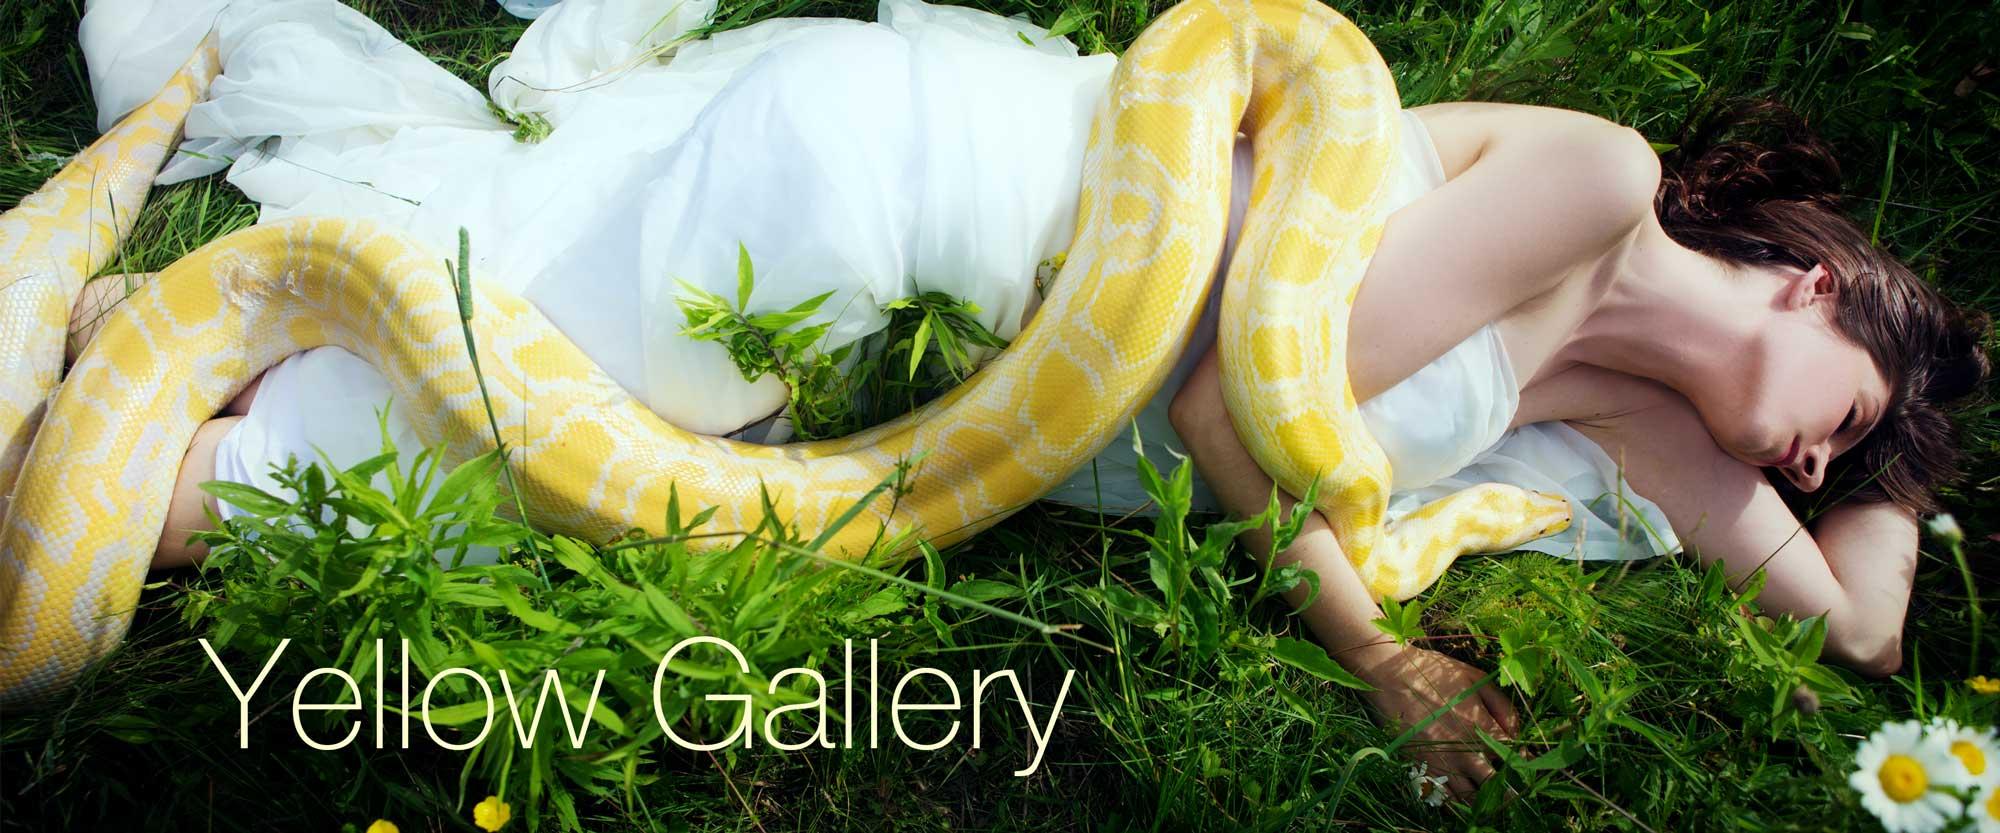 Laüra Hollick's Yellow Gallery